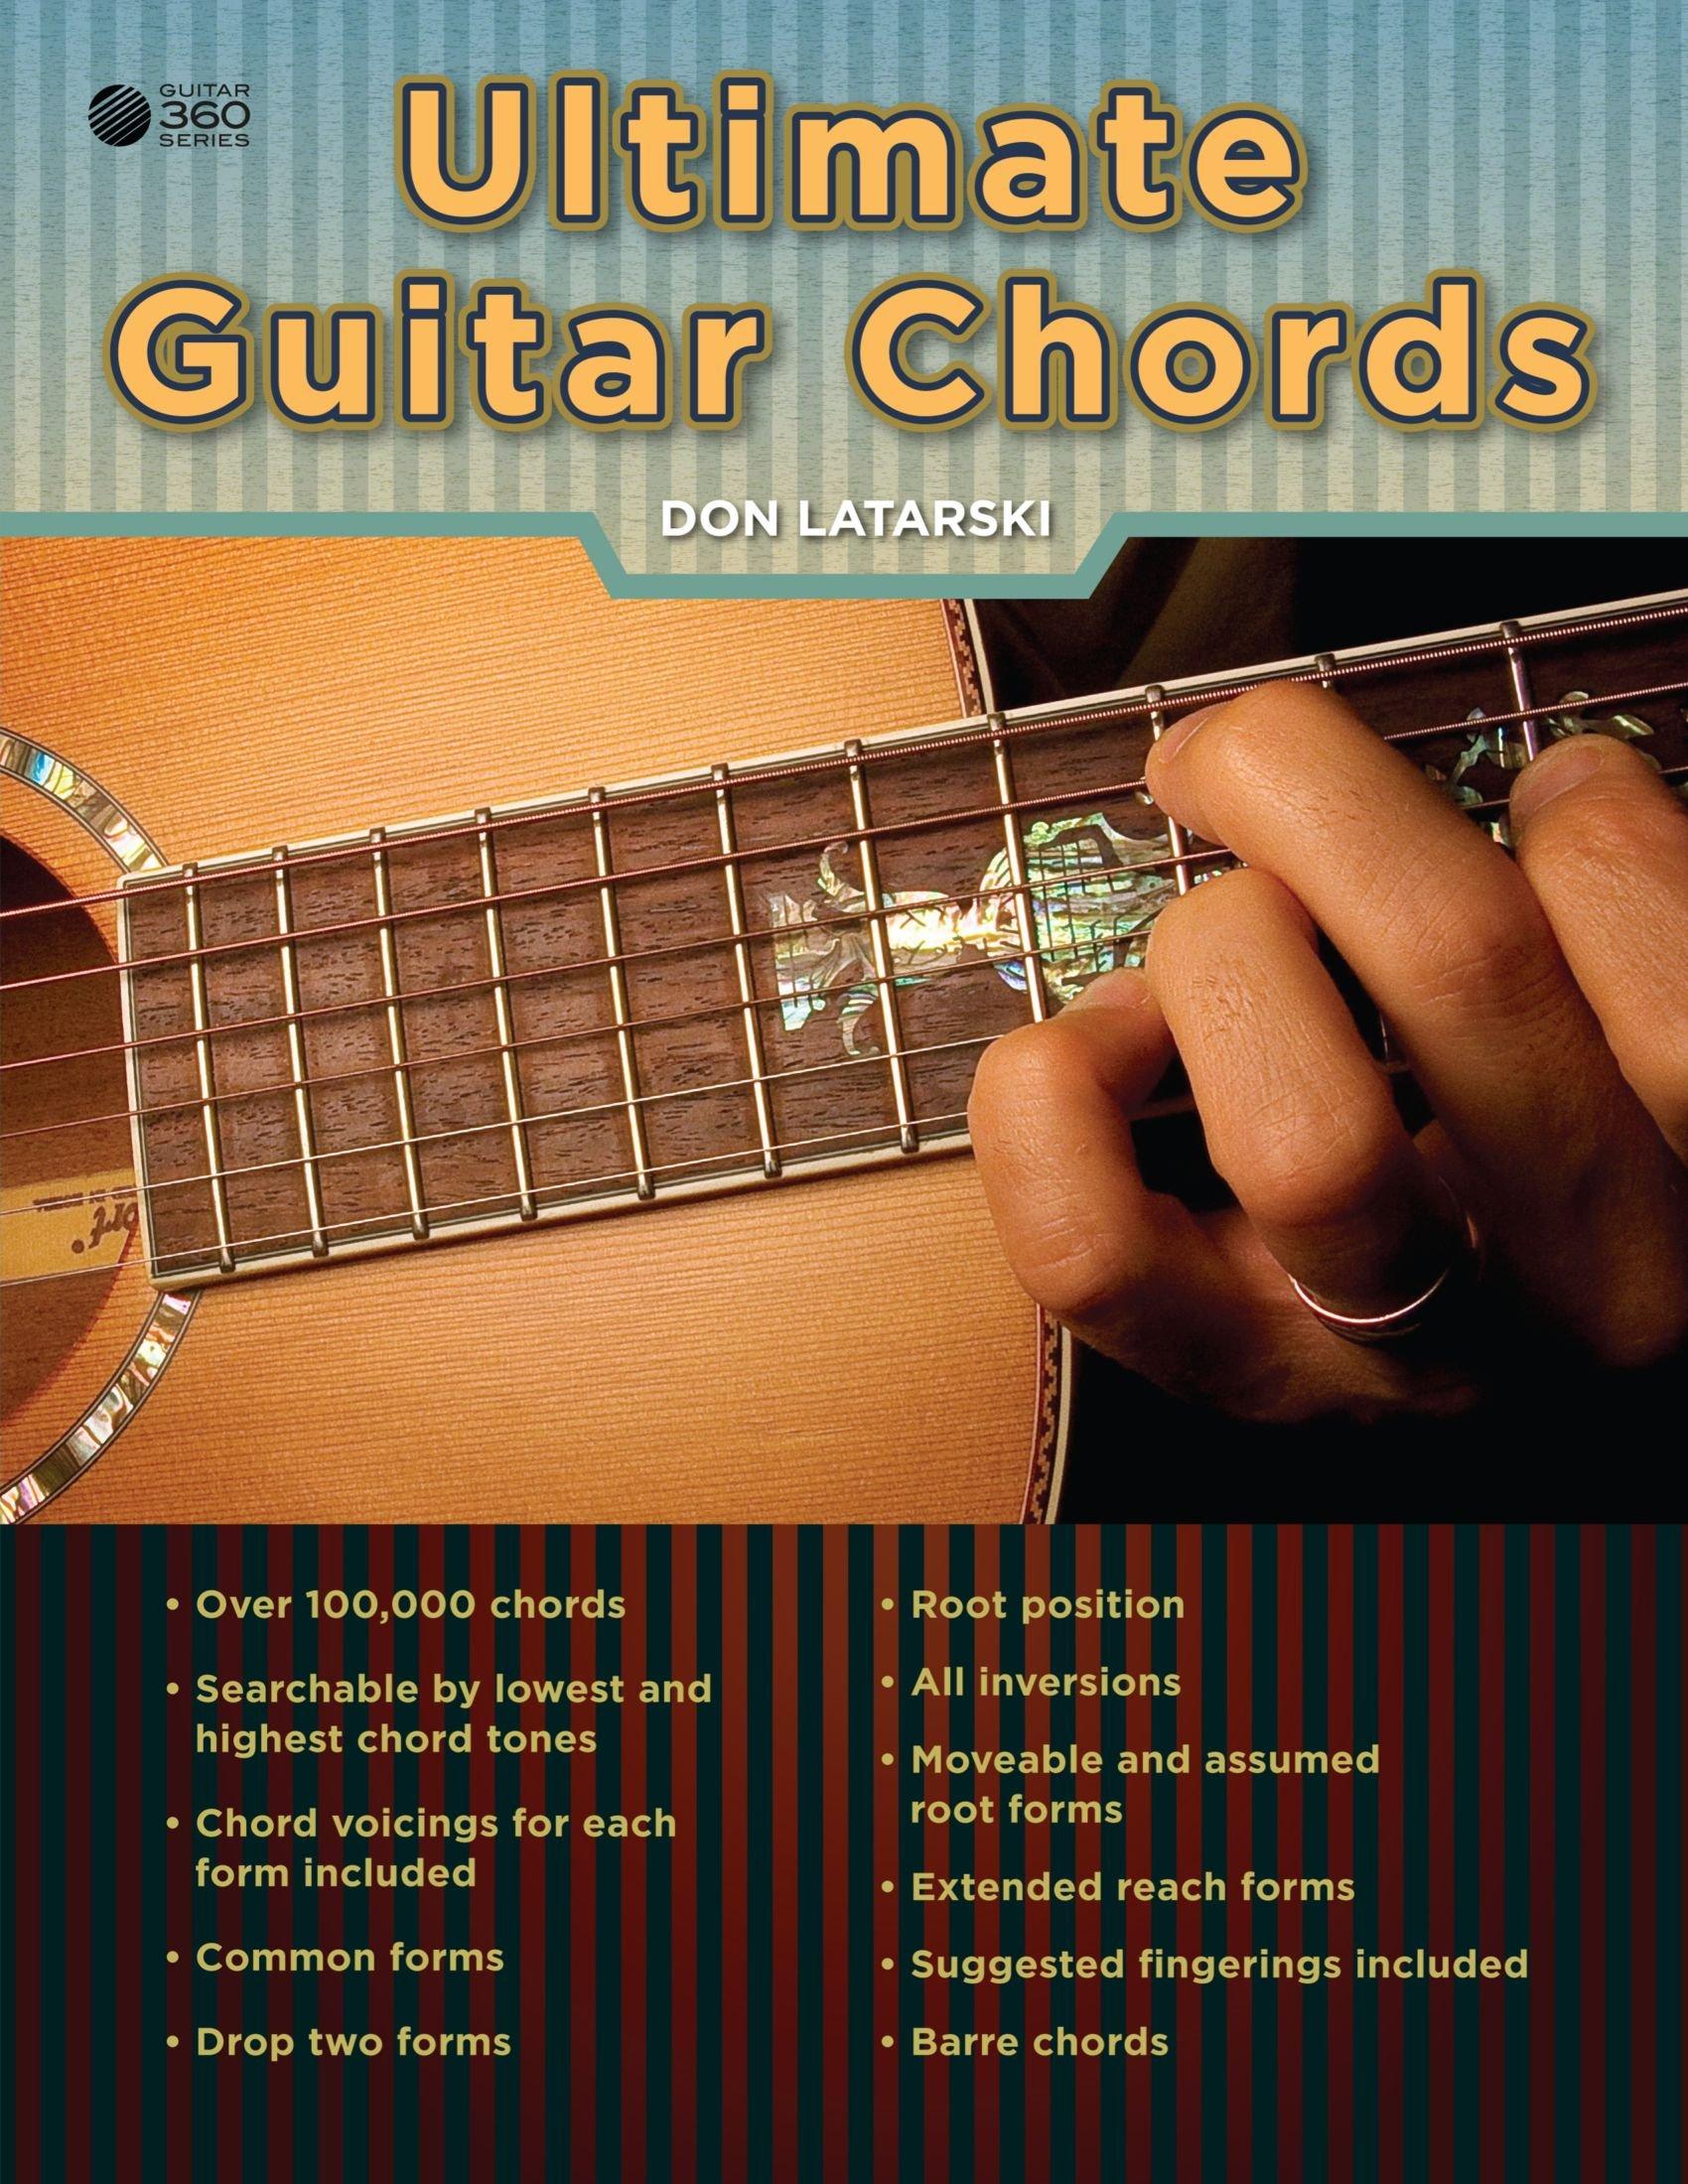 Ultimate Guitar Chords Don Latarski 9780557719136 Amazon Books